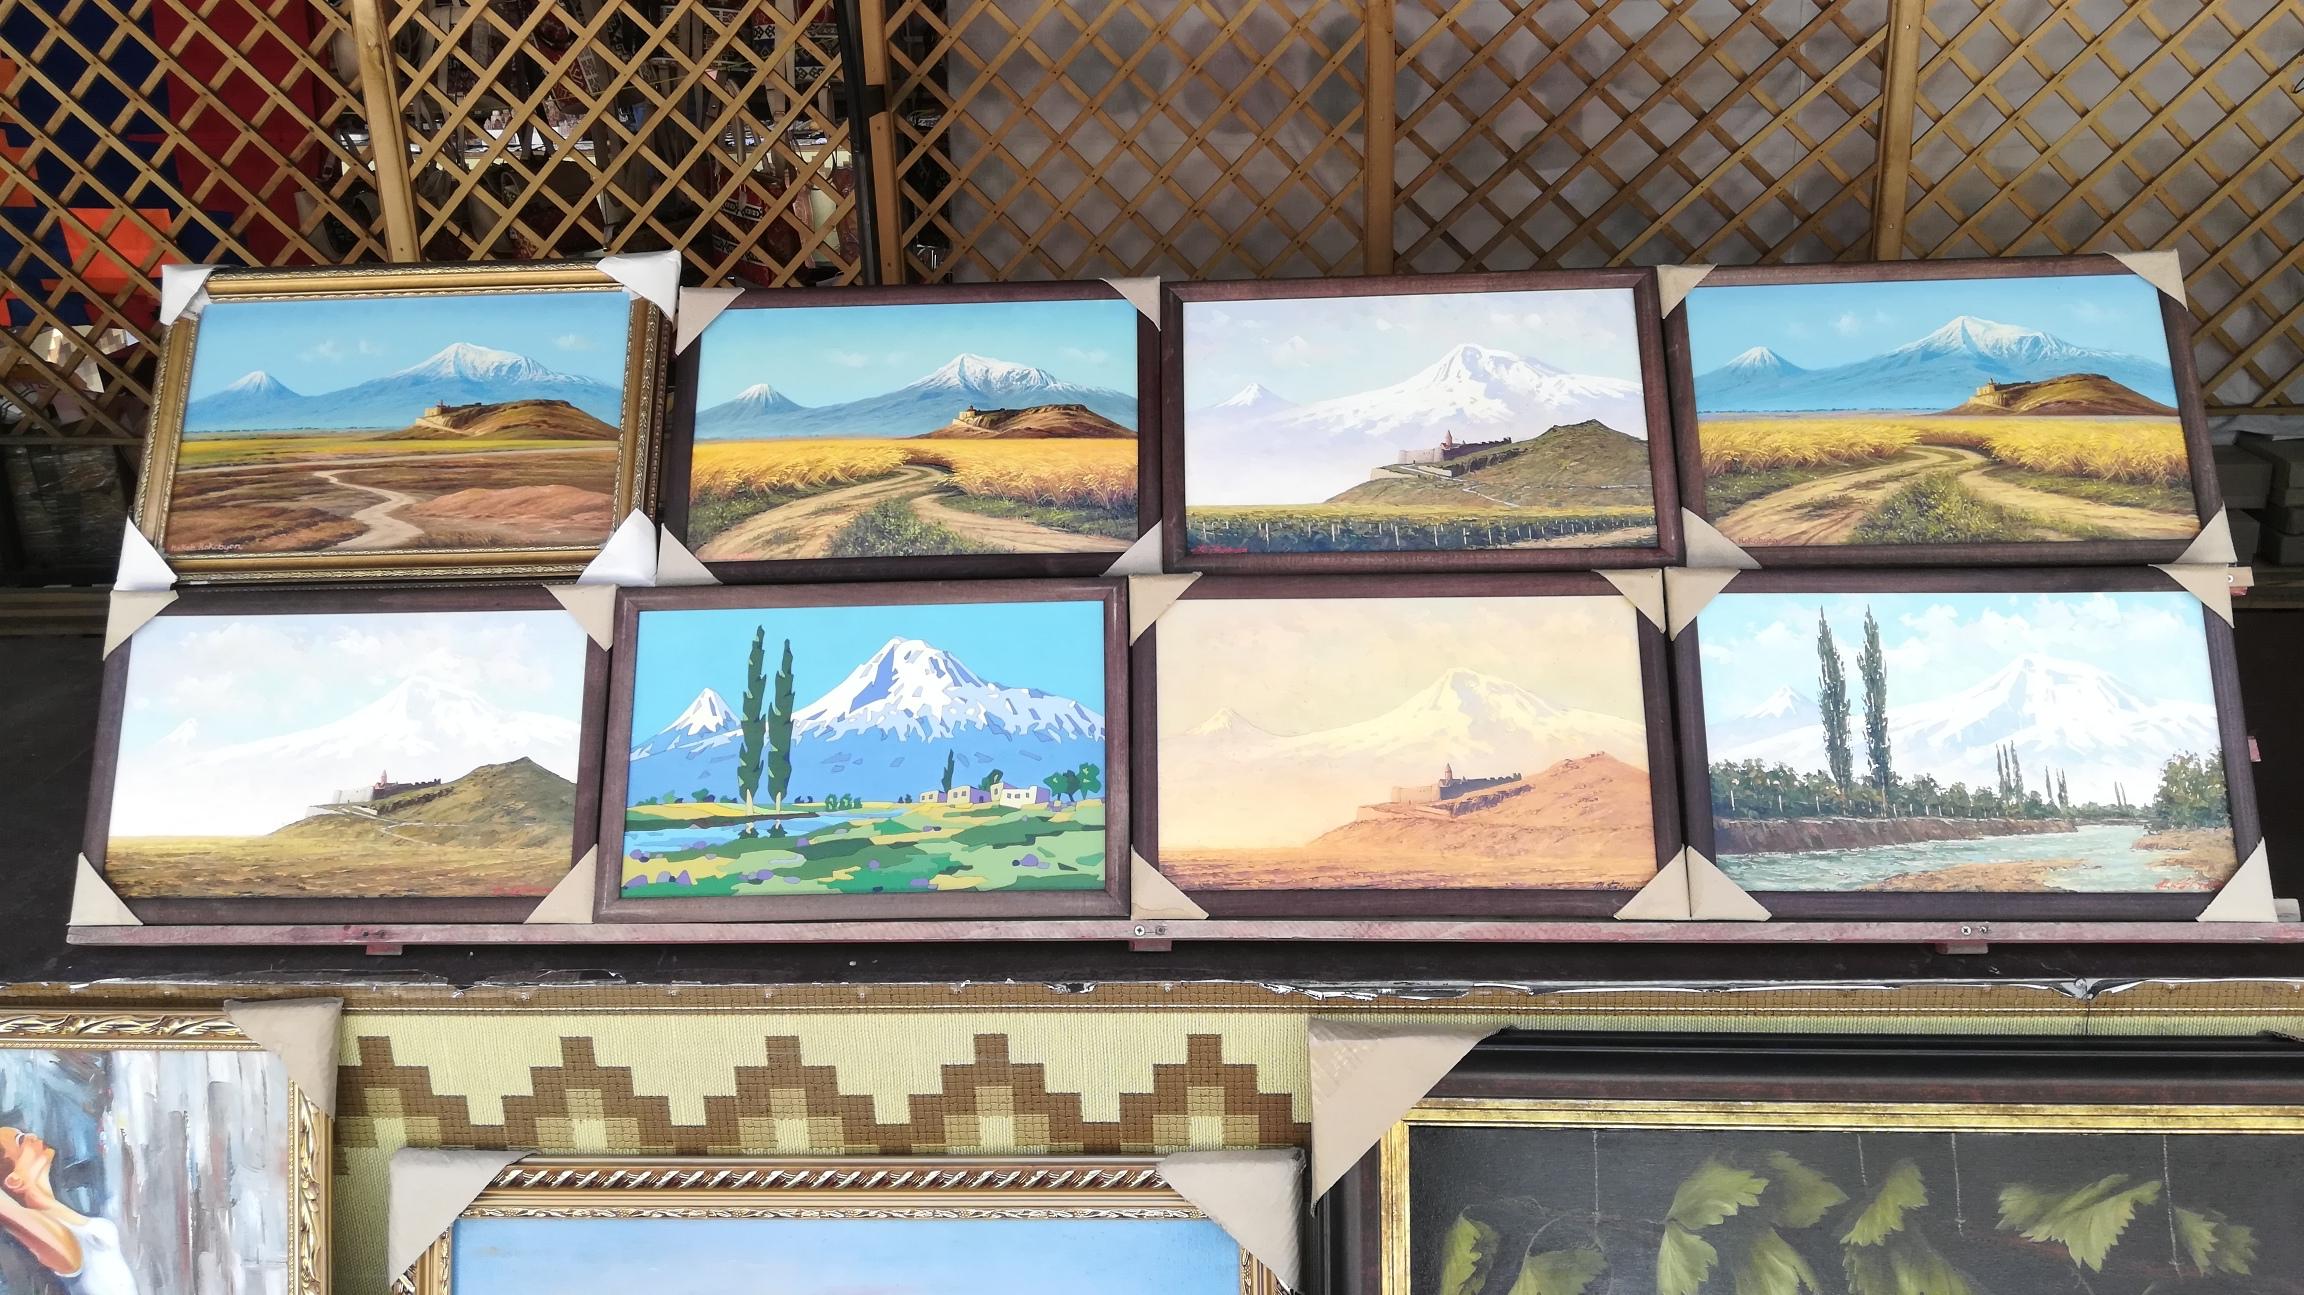 paintings of my ararat at the yerevan vernissage2.jpg